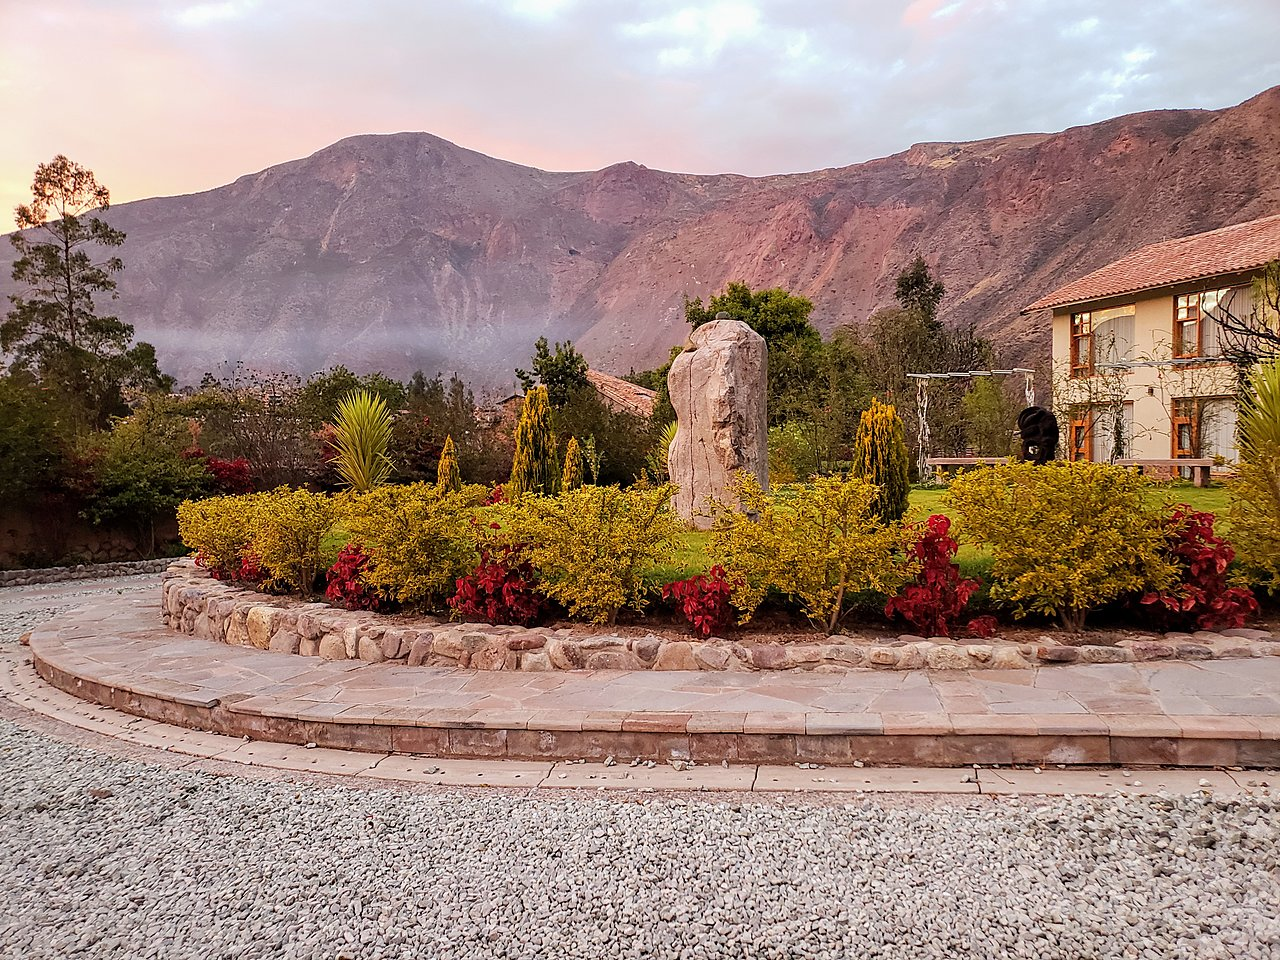 Kristy Tizon - Peru Travel Specialist | kimkim